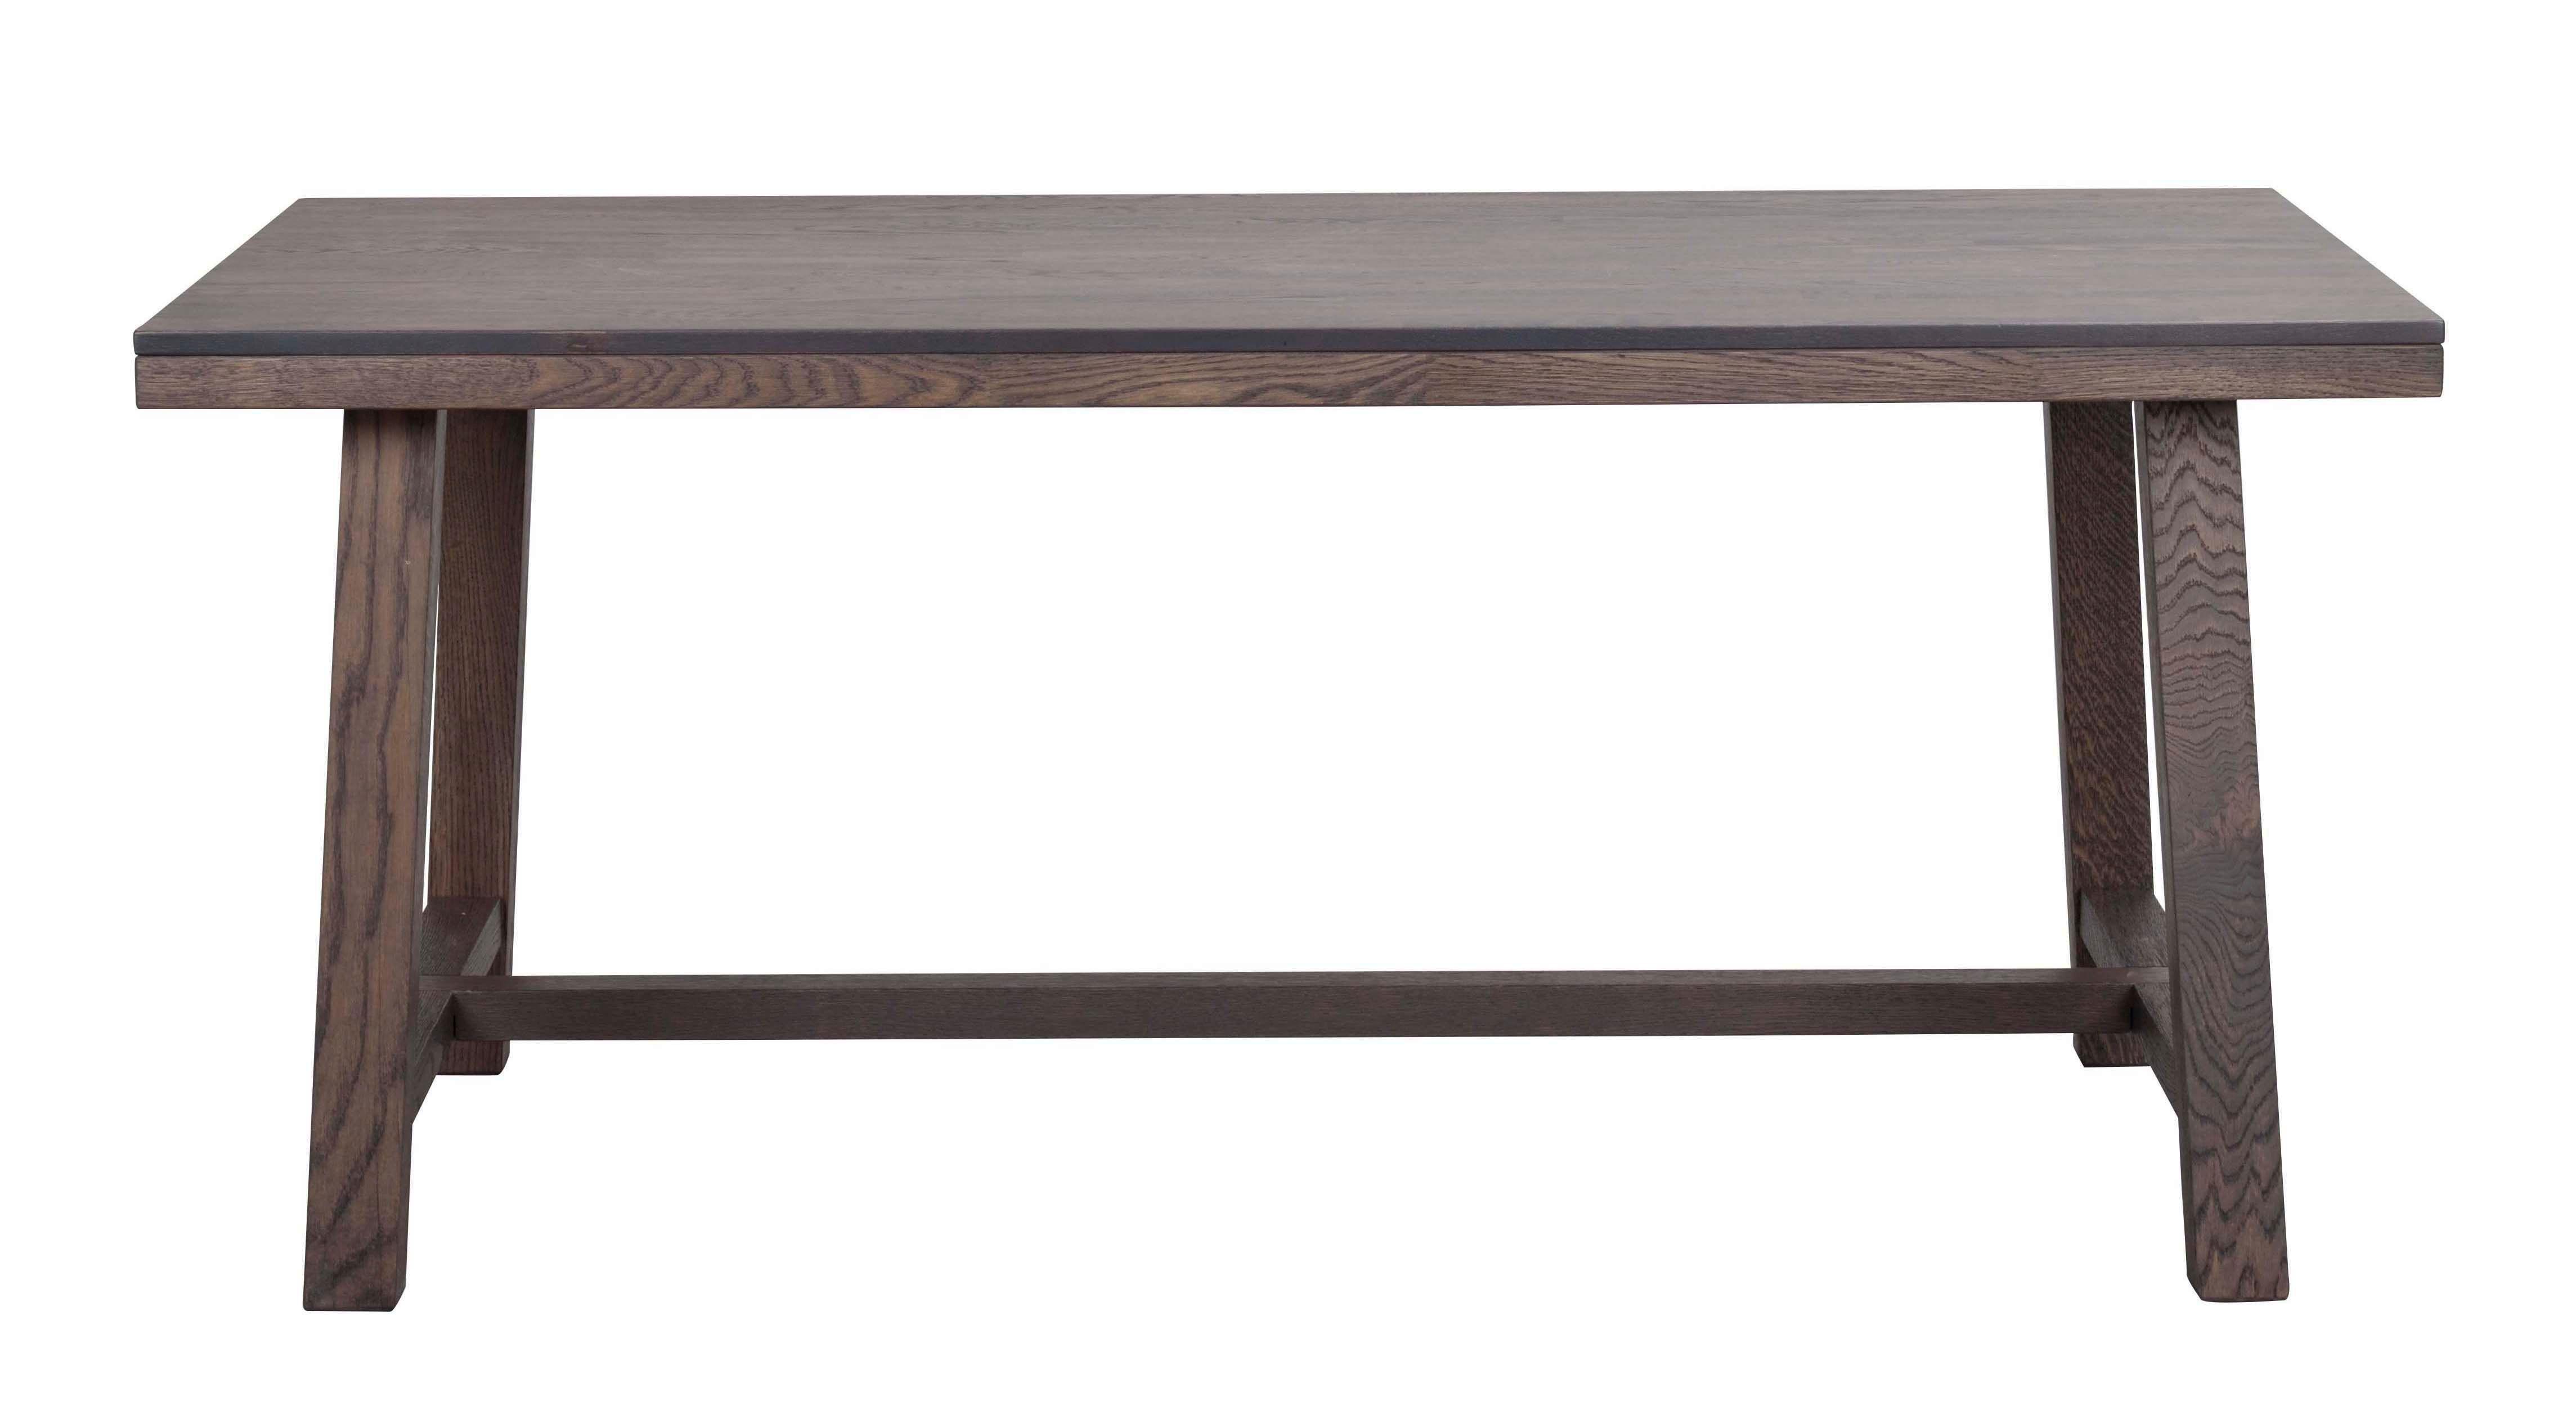 BROOKLYN 170 cm DINING TABLE Smoke